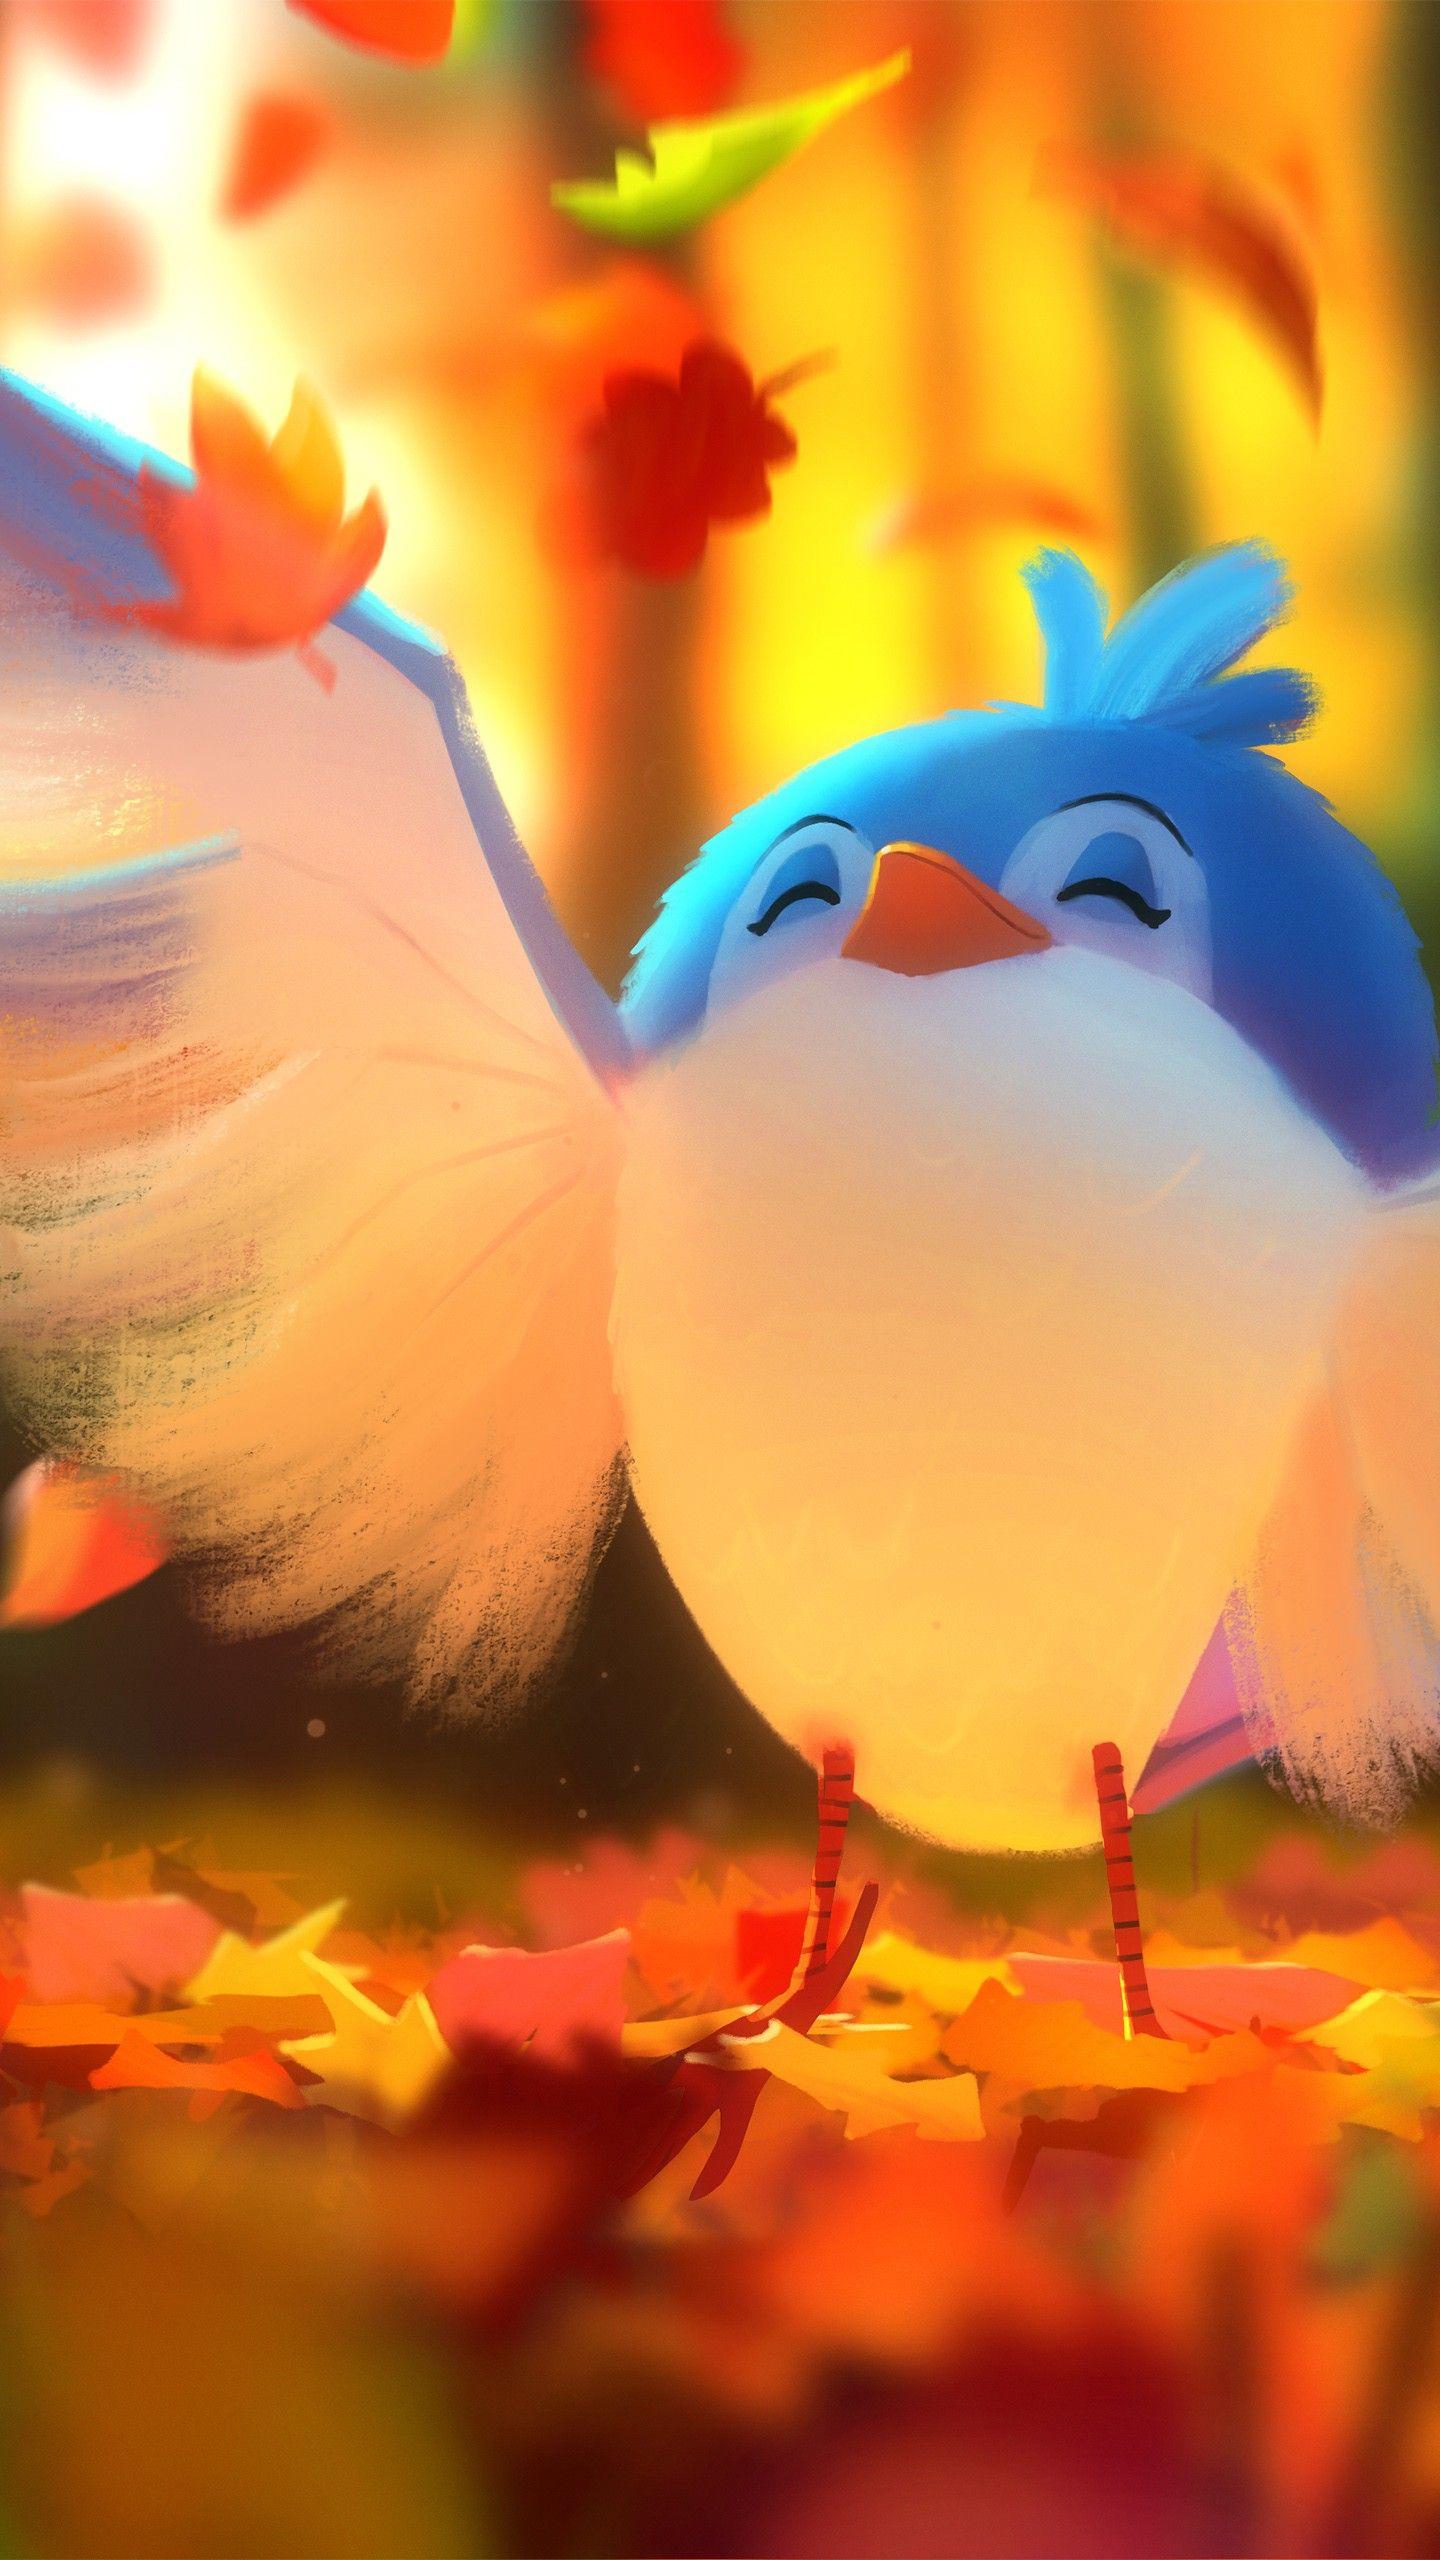 Misc Cute bird Digital art 4K wallpapers hd 4k